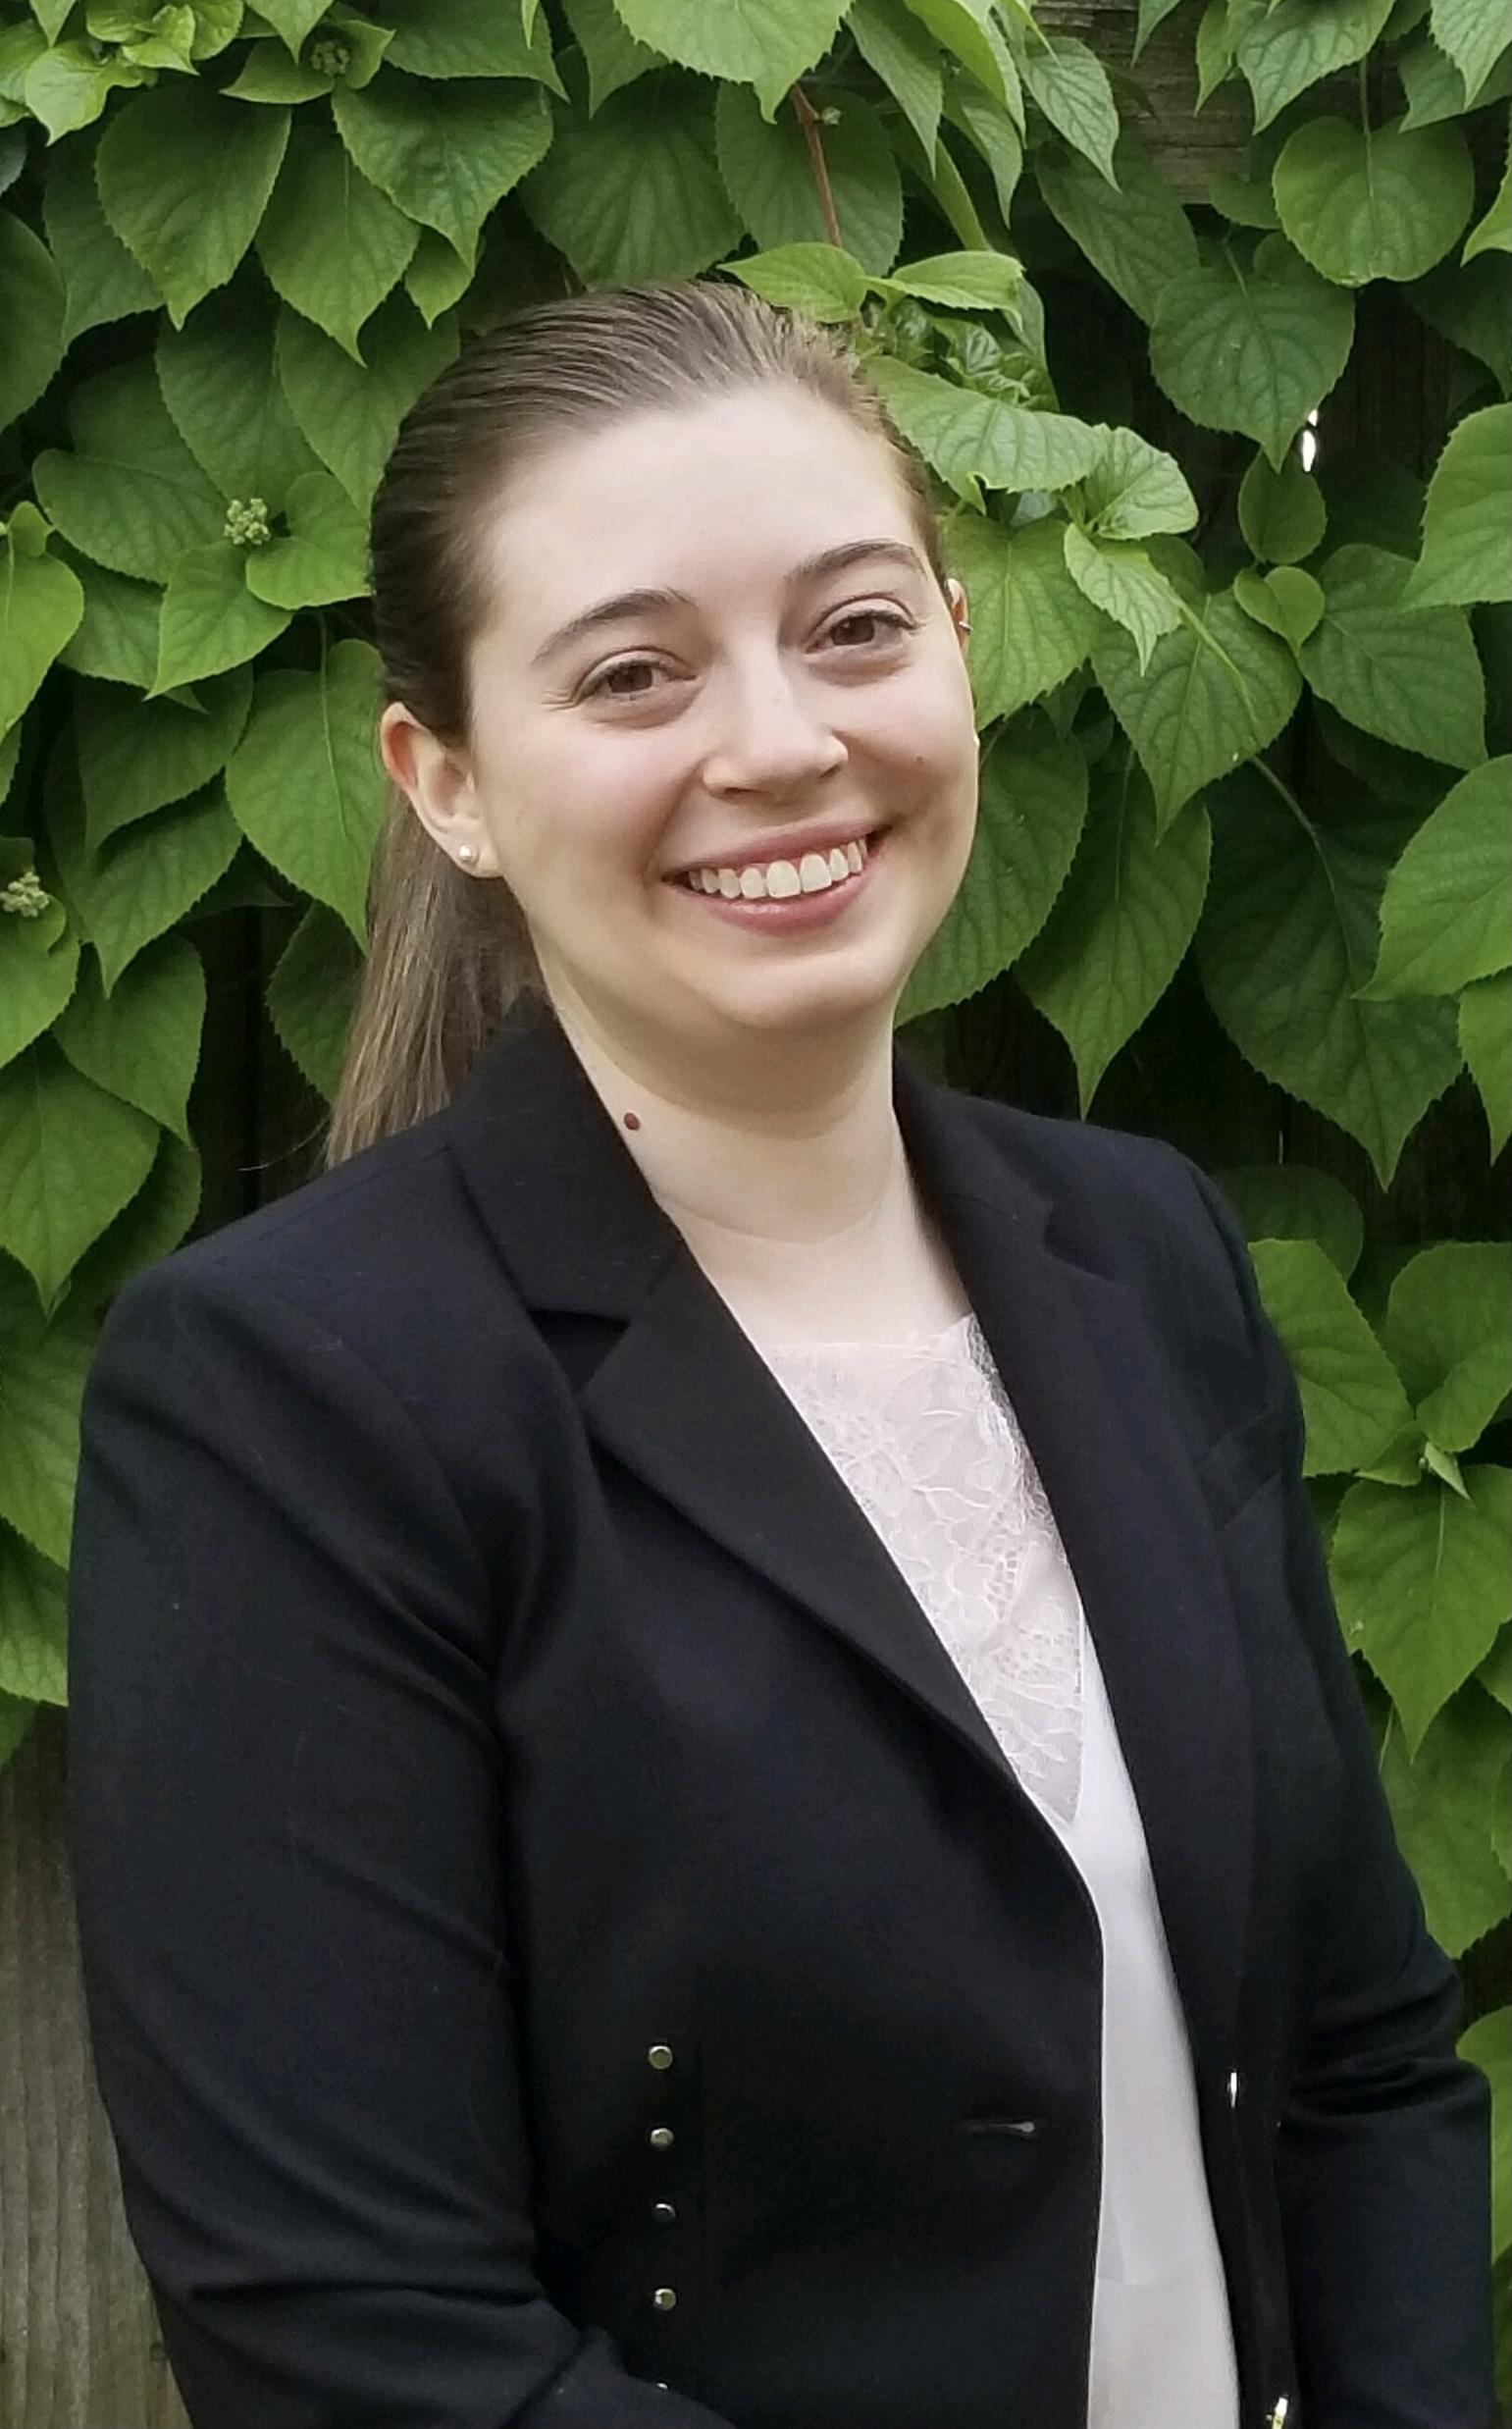 Samantha Sloane